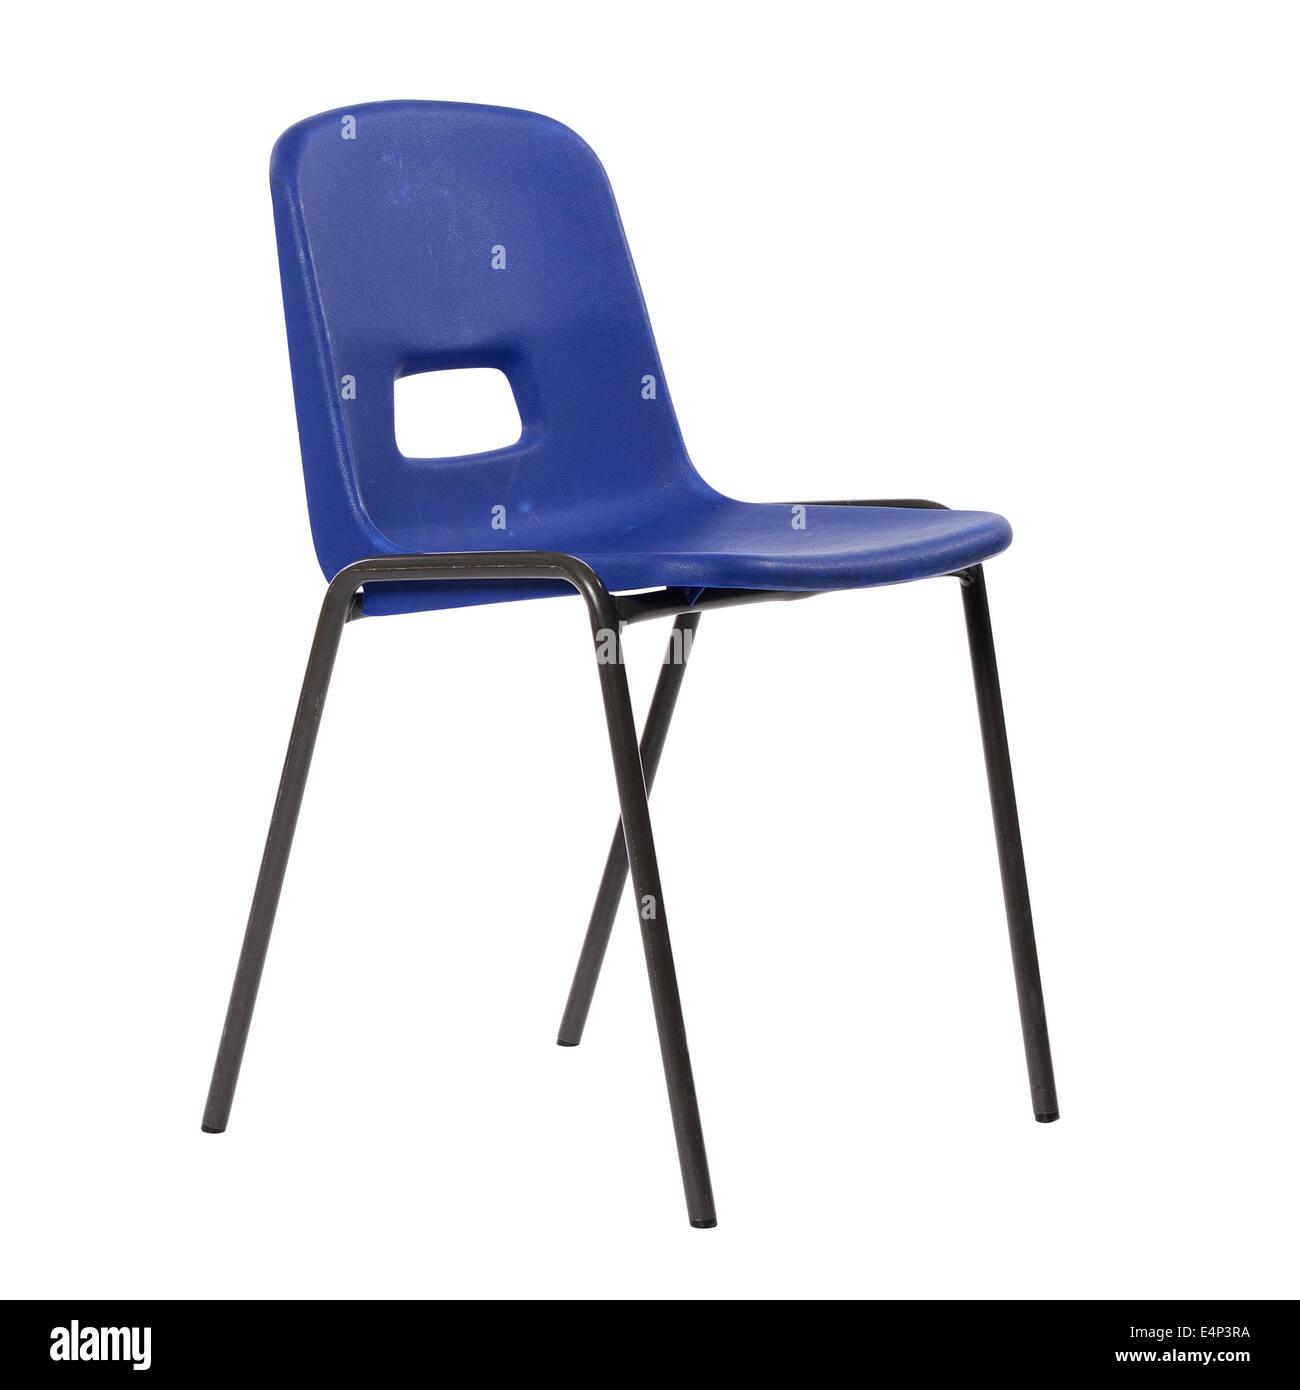 school chair plastic stock photos school chair plastic stock